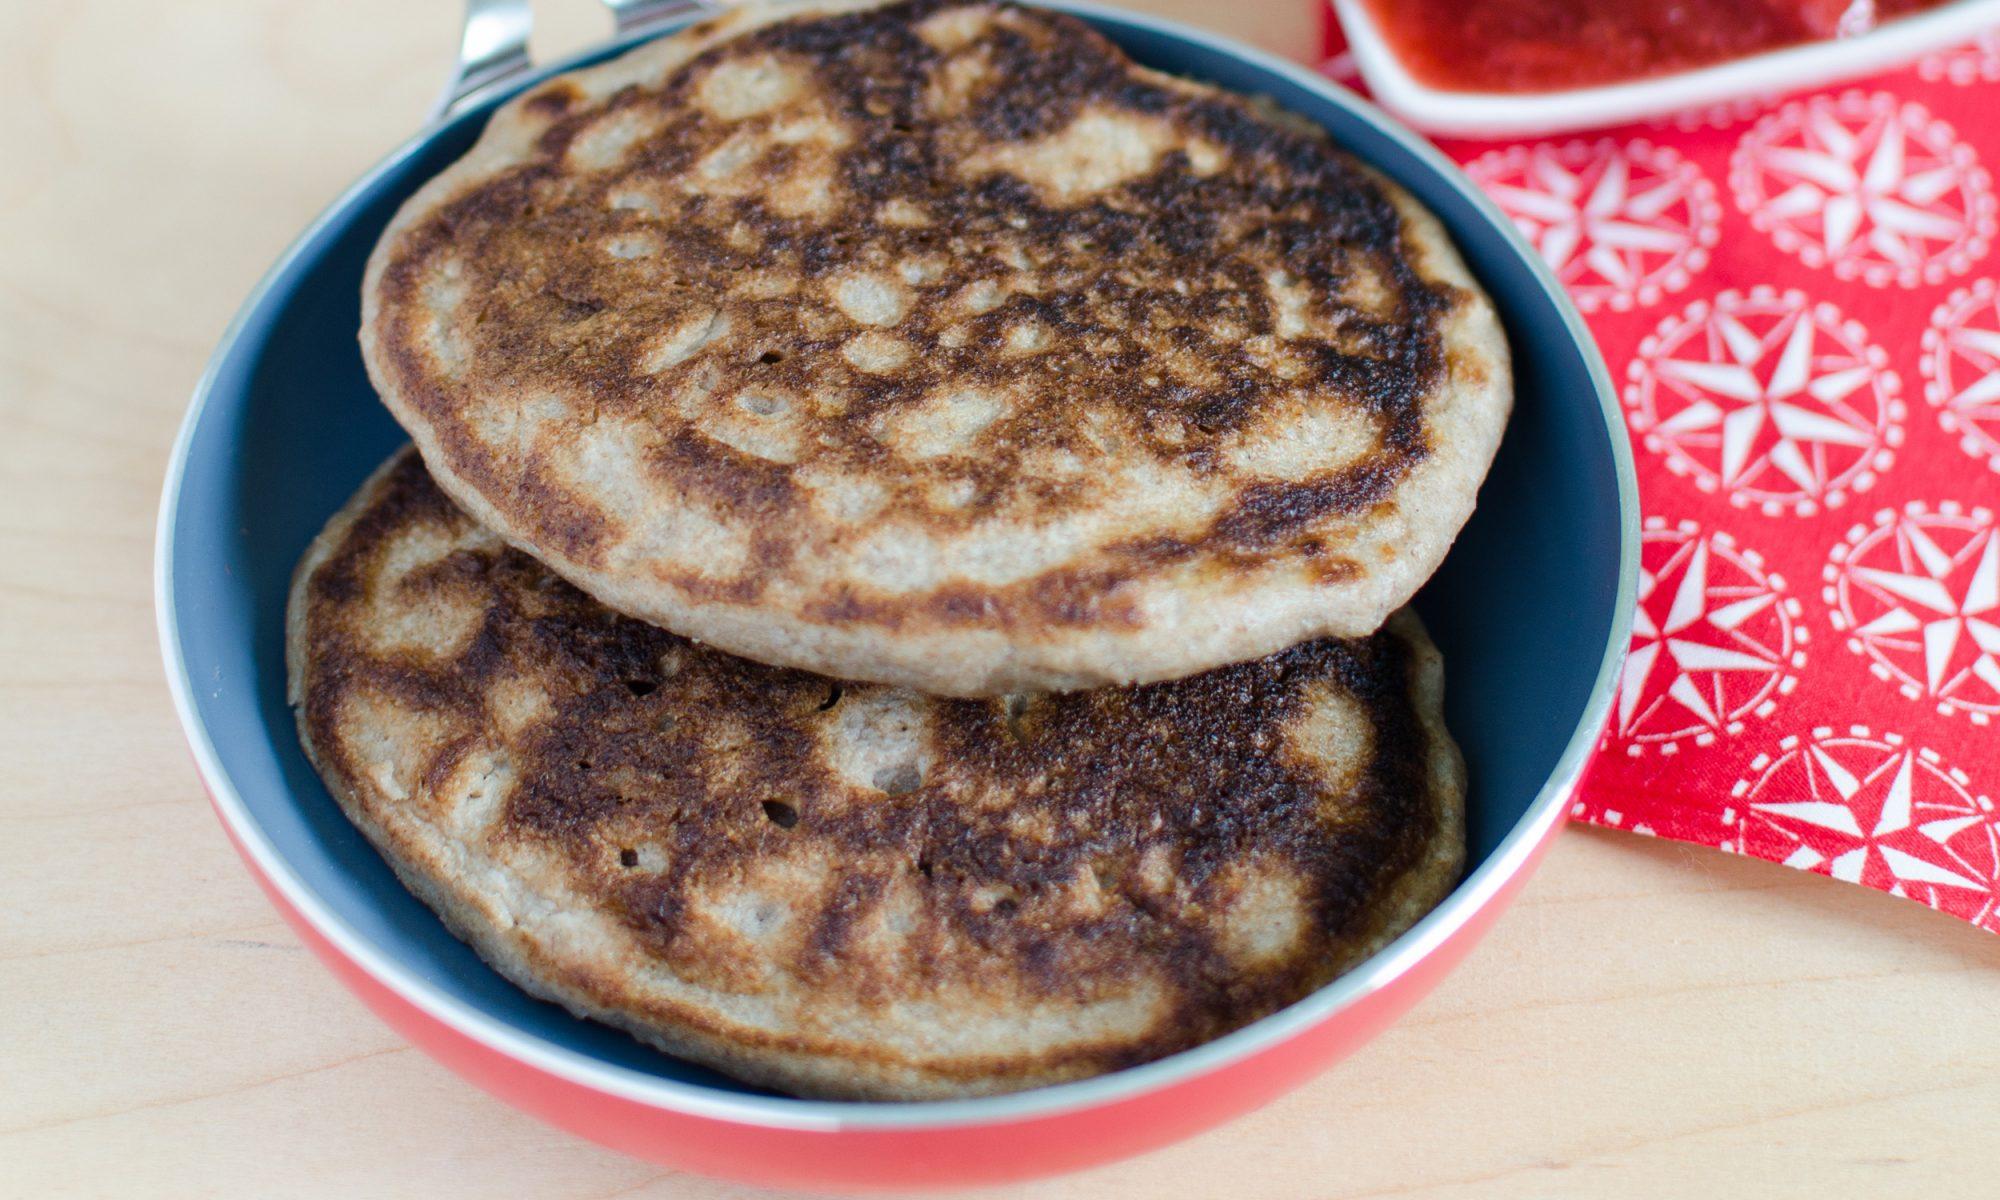 Sourdough Buckwheat Pancakes with Sausage Gravy